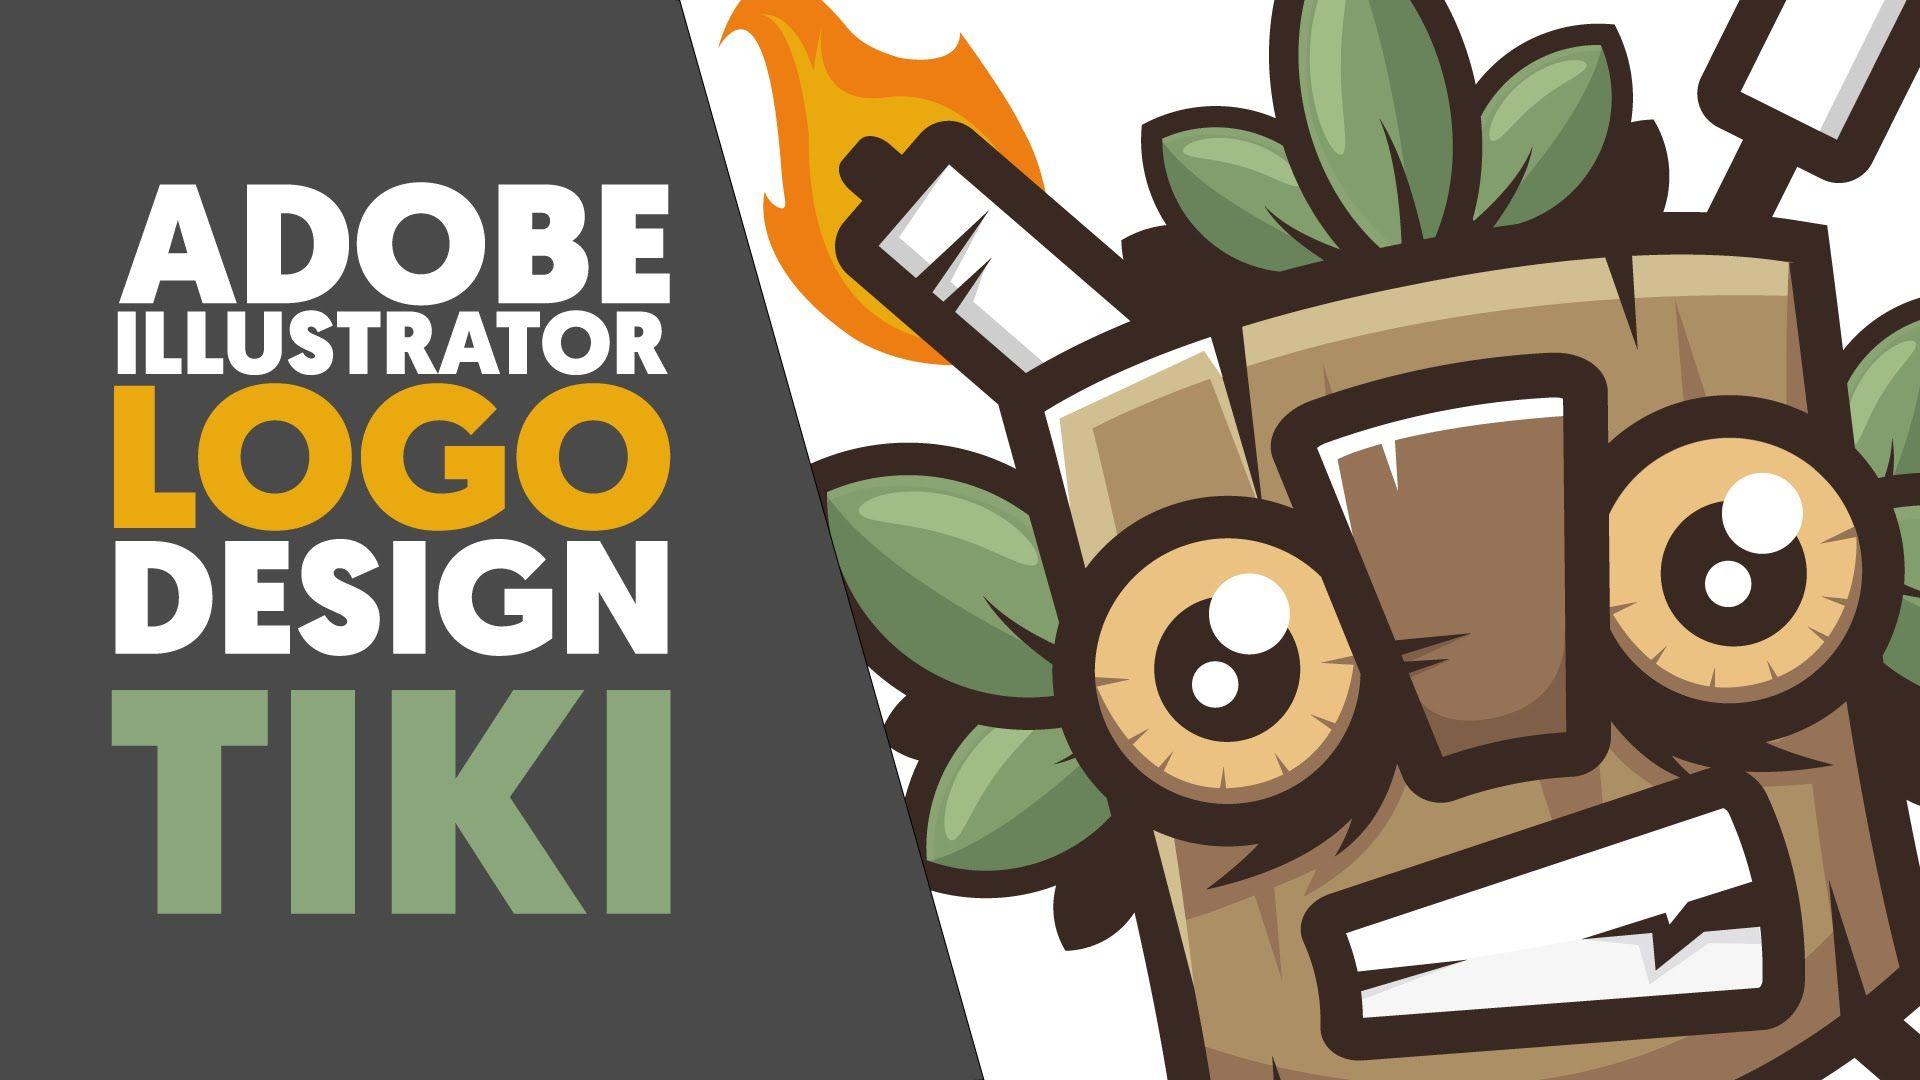 Adobe Illustrator Logo design / Illustration TIKI